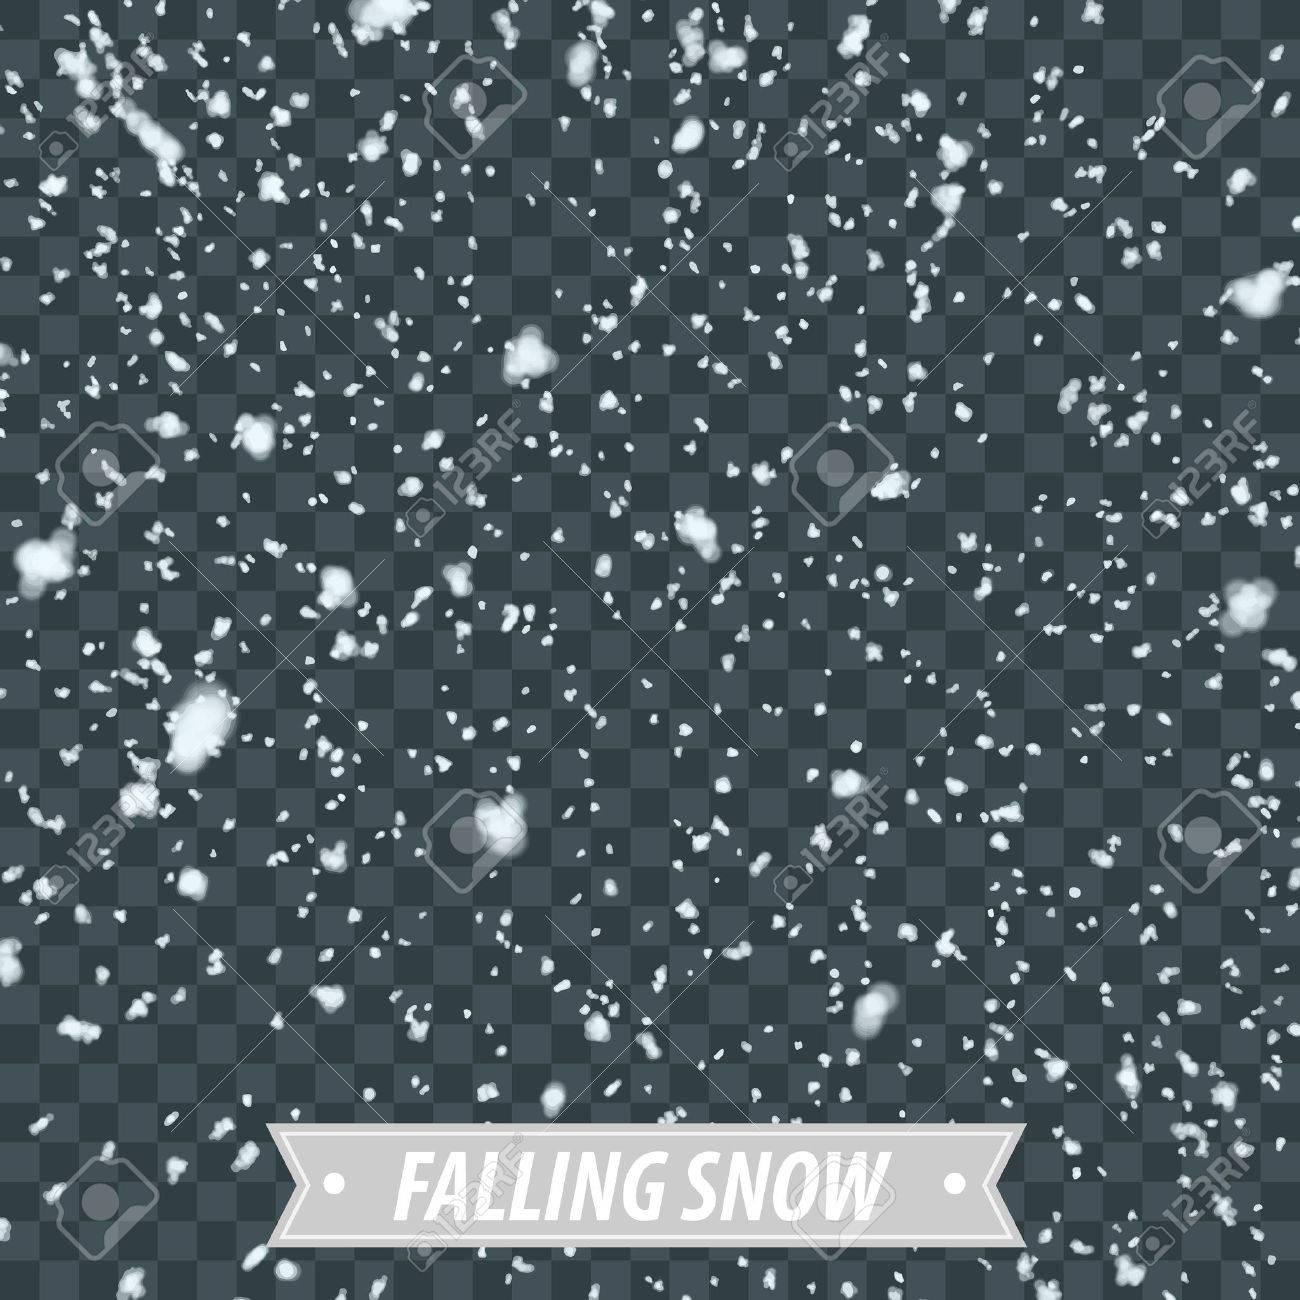 Isolated Heavy Snow Falling EPS10 Vector - 50955806